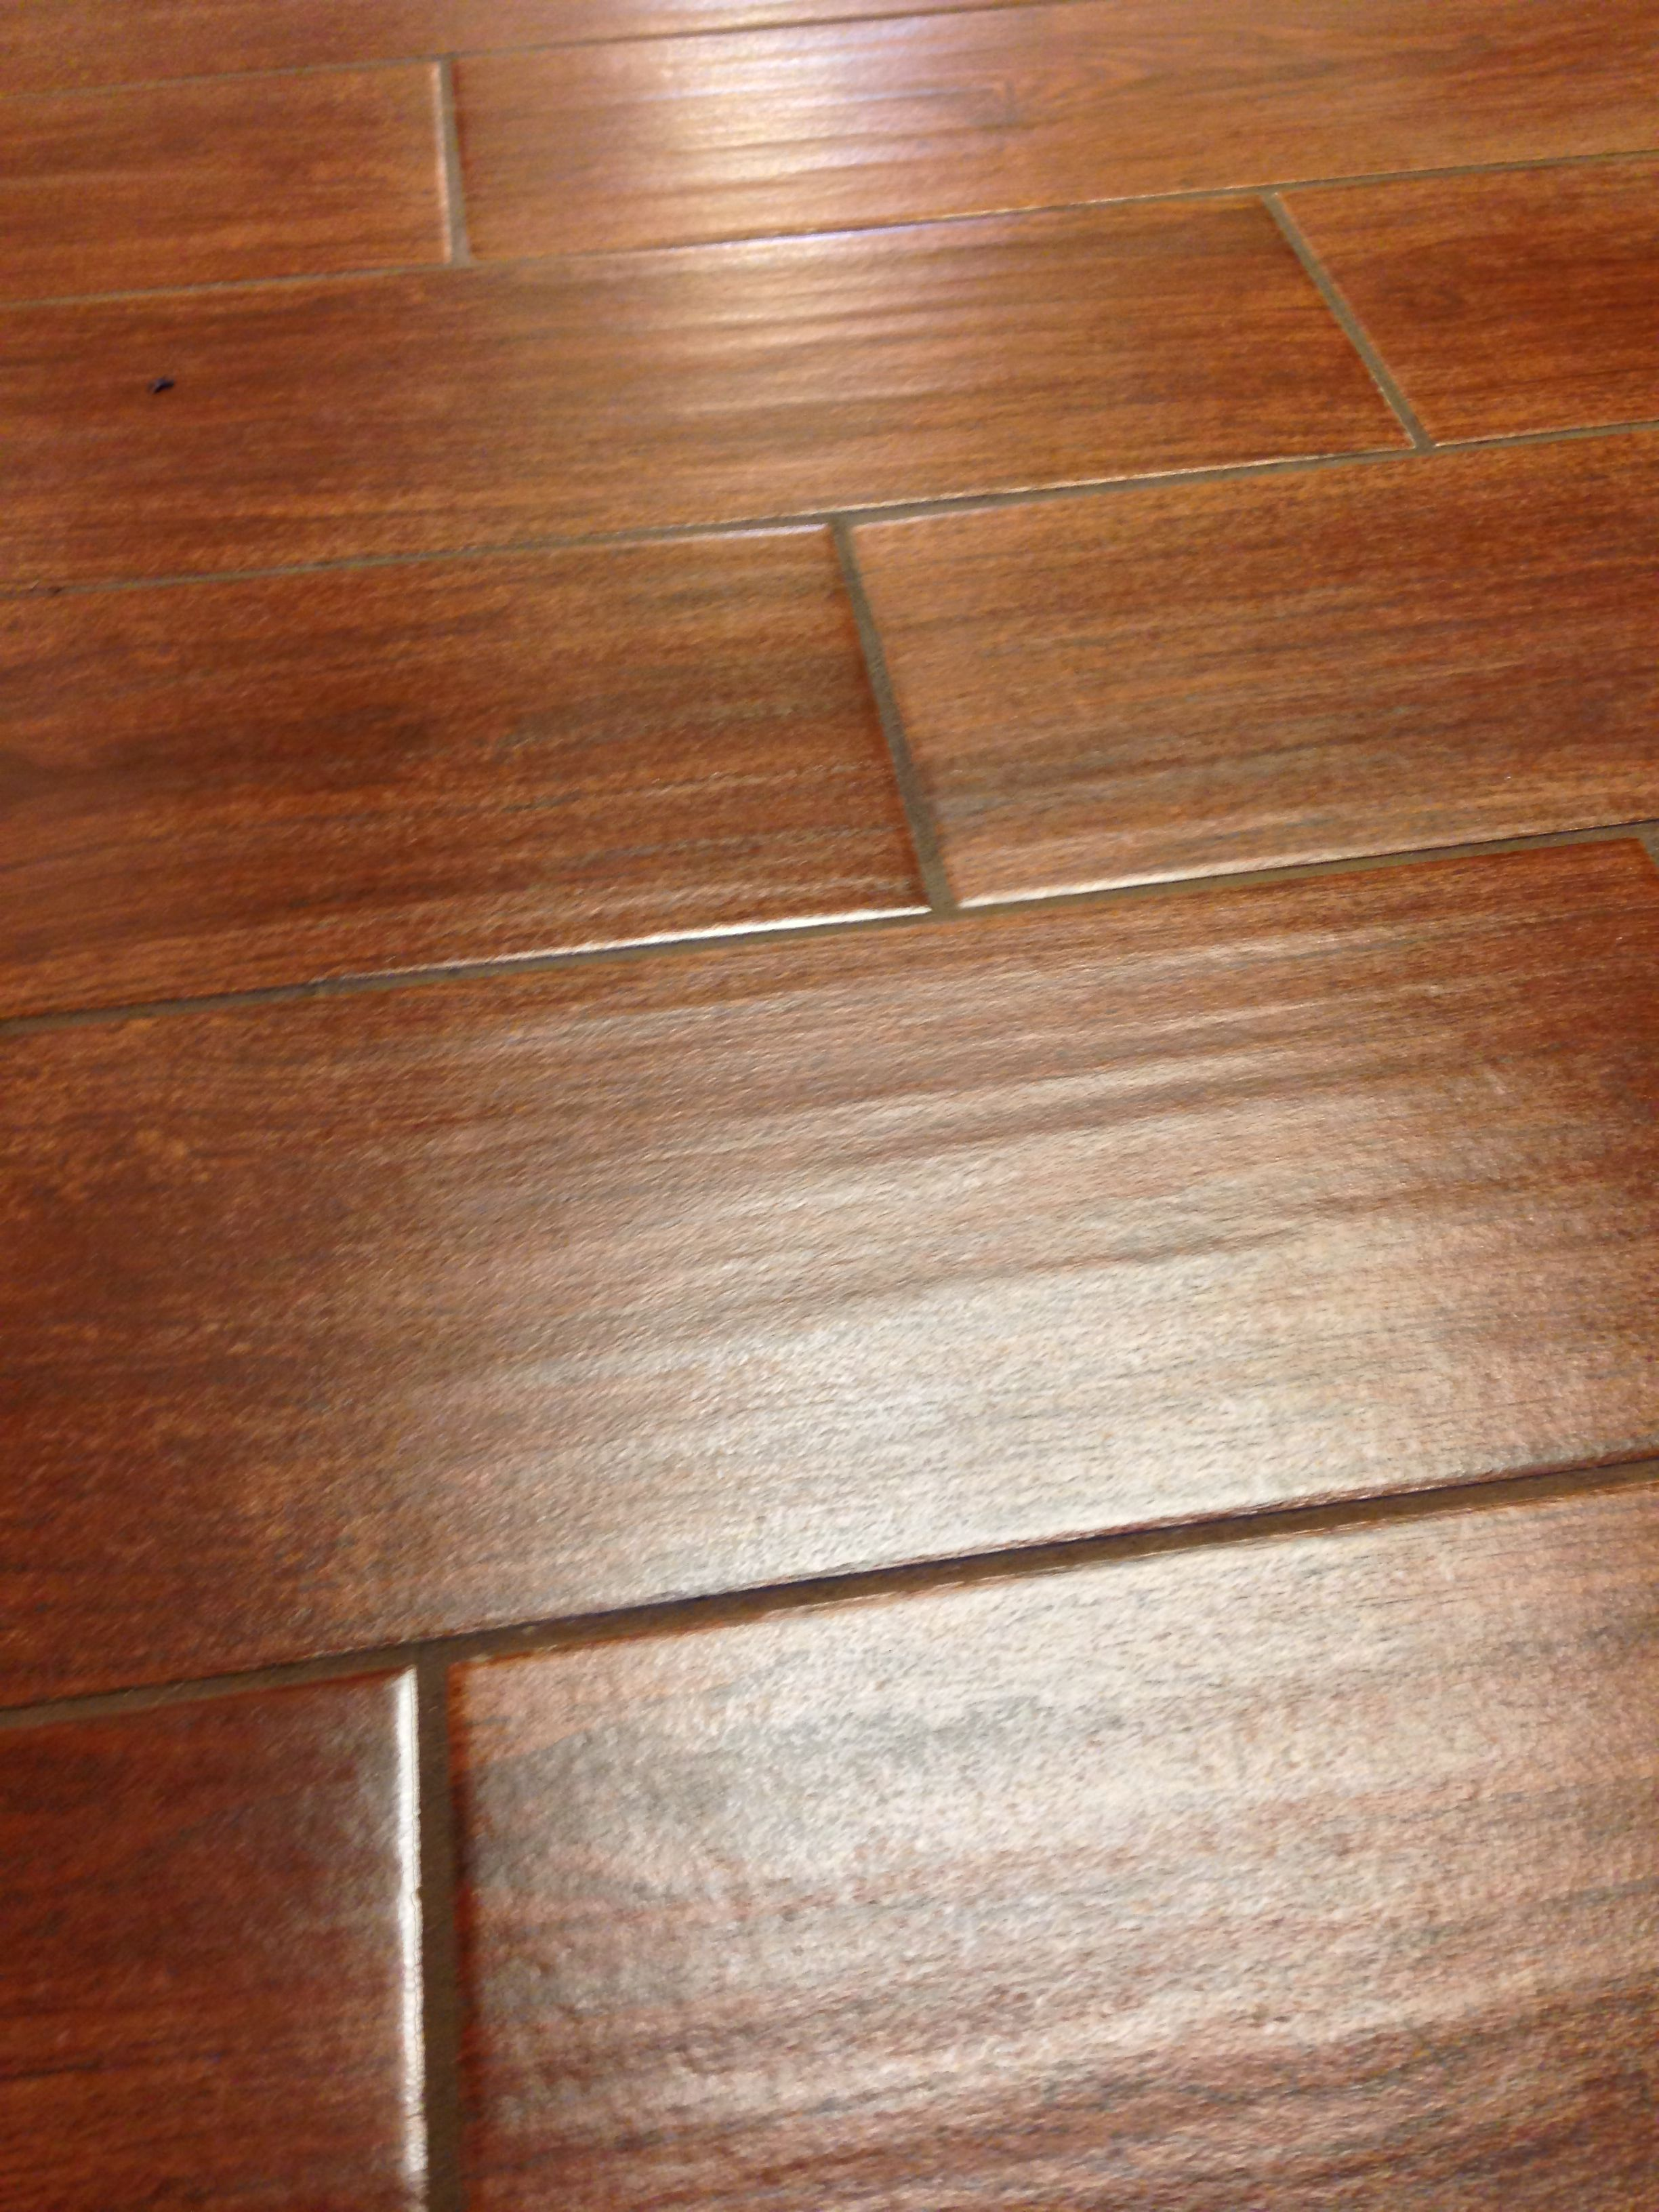 Wood look tile on pinterest porcelain wood tile ceramic tile that wood look tile on pinterest porcelain wood tile ceramic tile that looks like wood dailygadgetfo Images